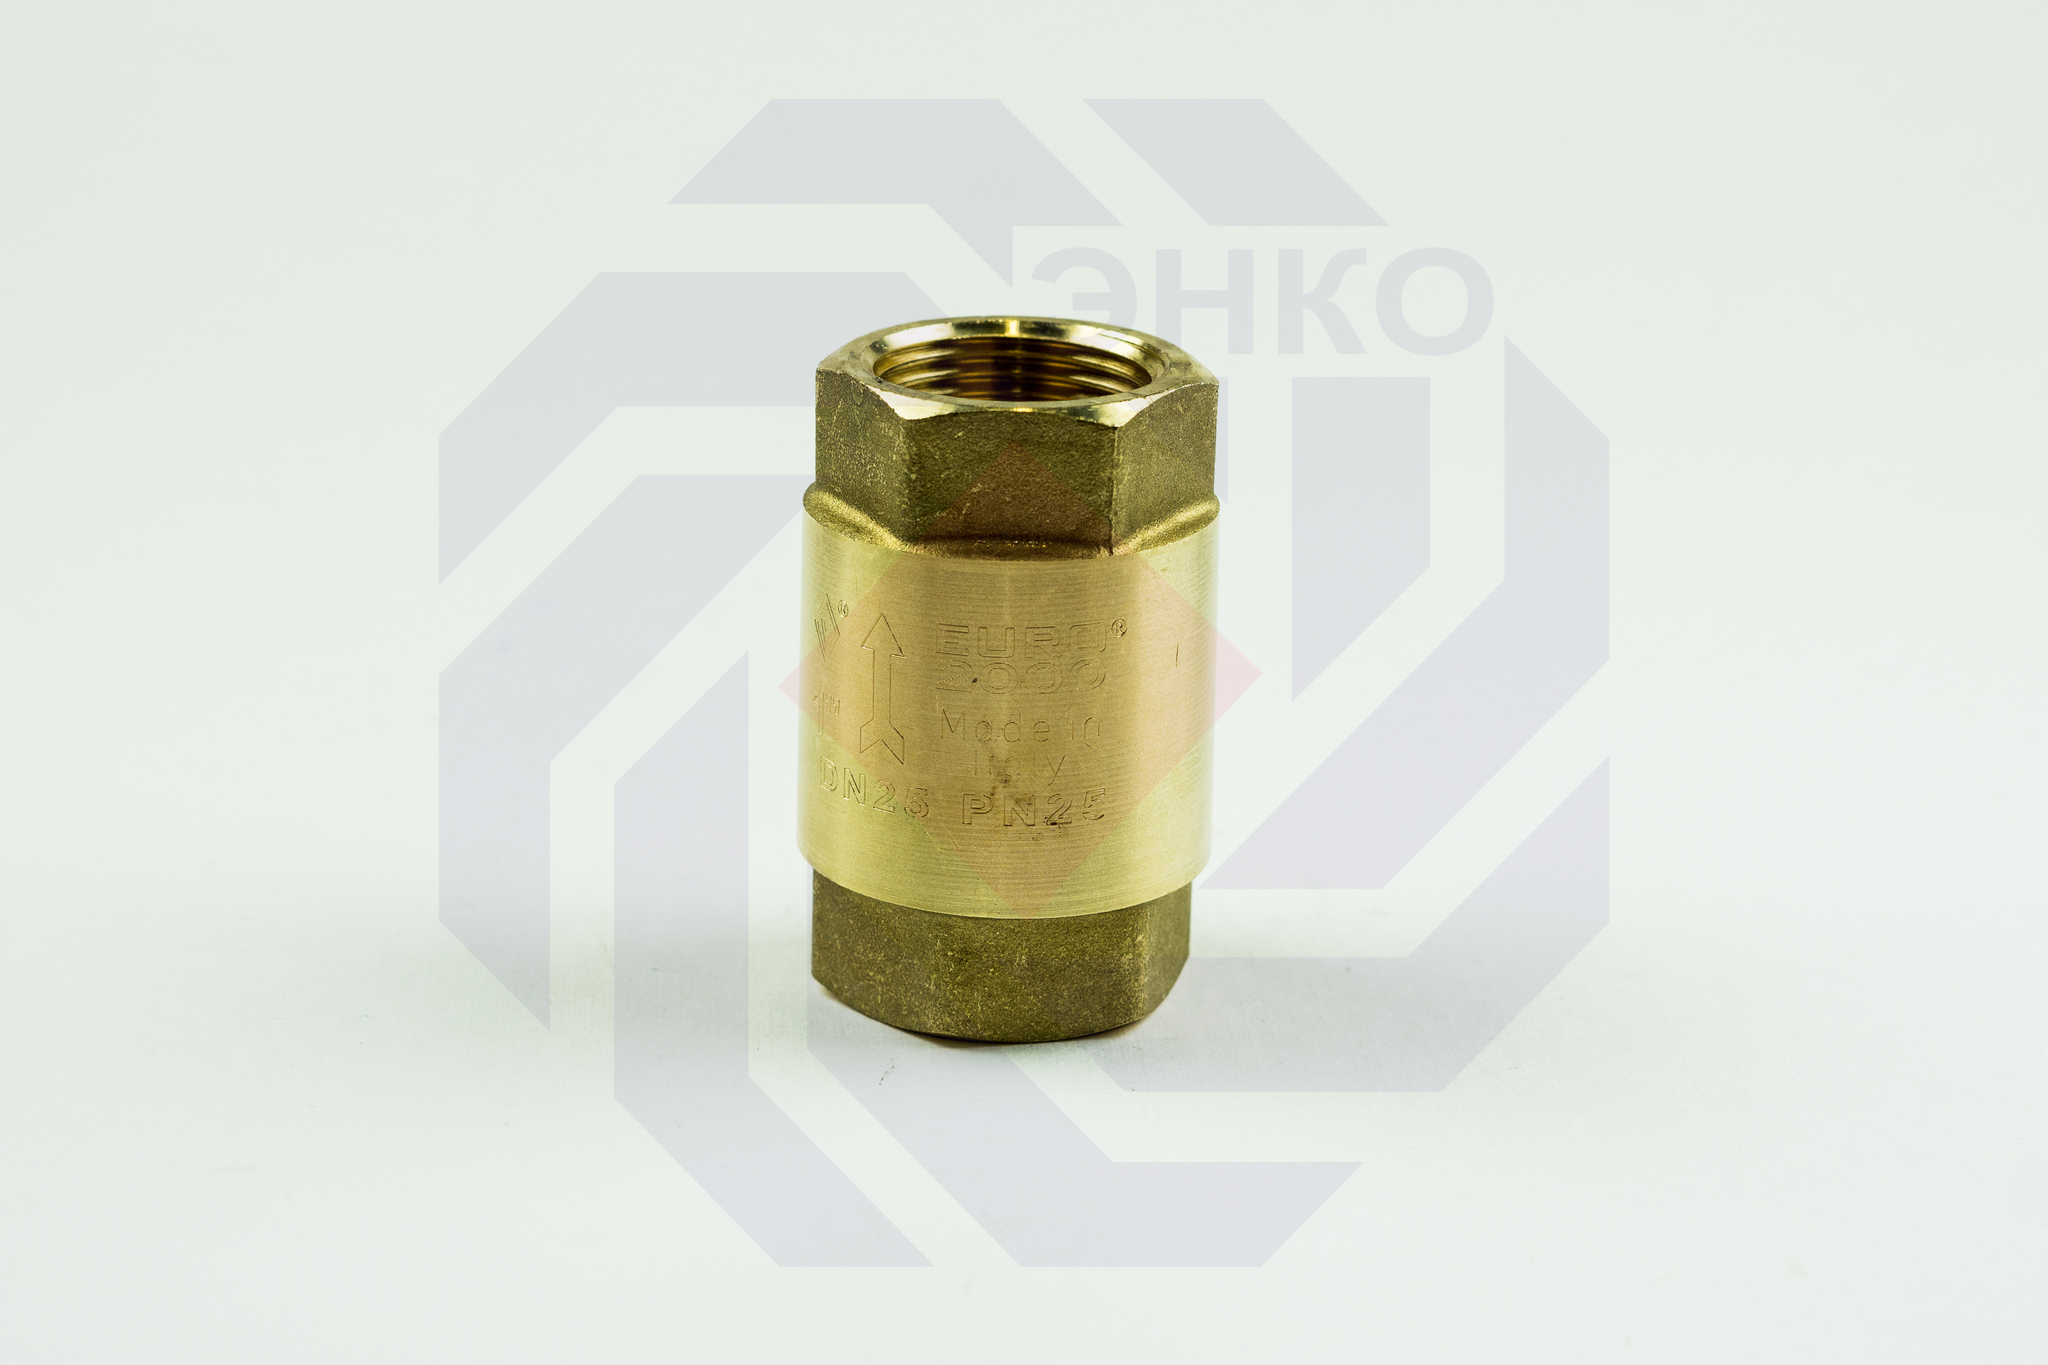 Клапан обратный ВР/ВР BUGATTI EURO 2000 1